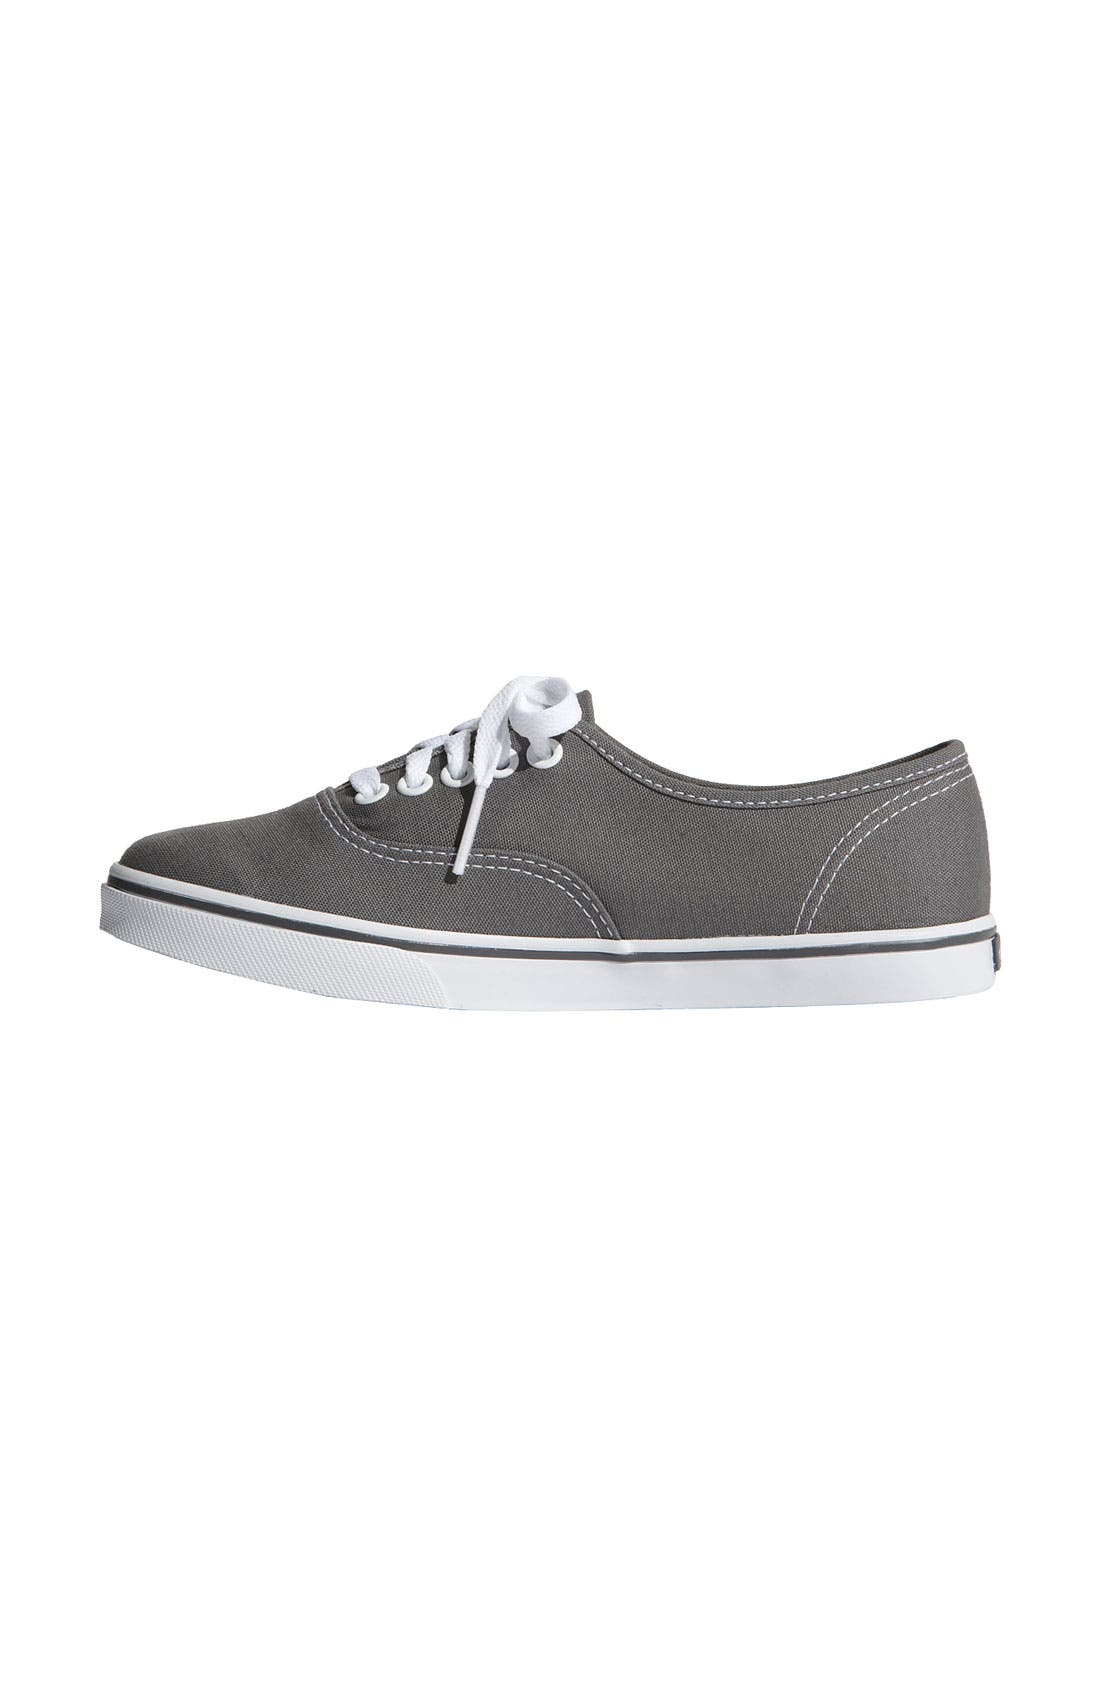 'Authentic - Lo Pro' Sneaker,                             Alternate thumbnail 4, color,                             021